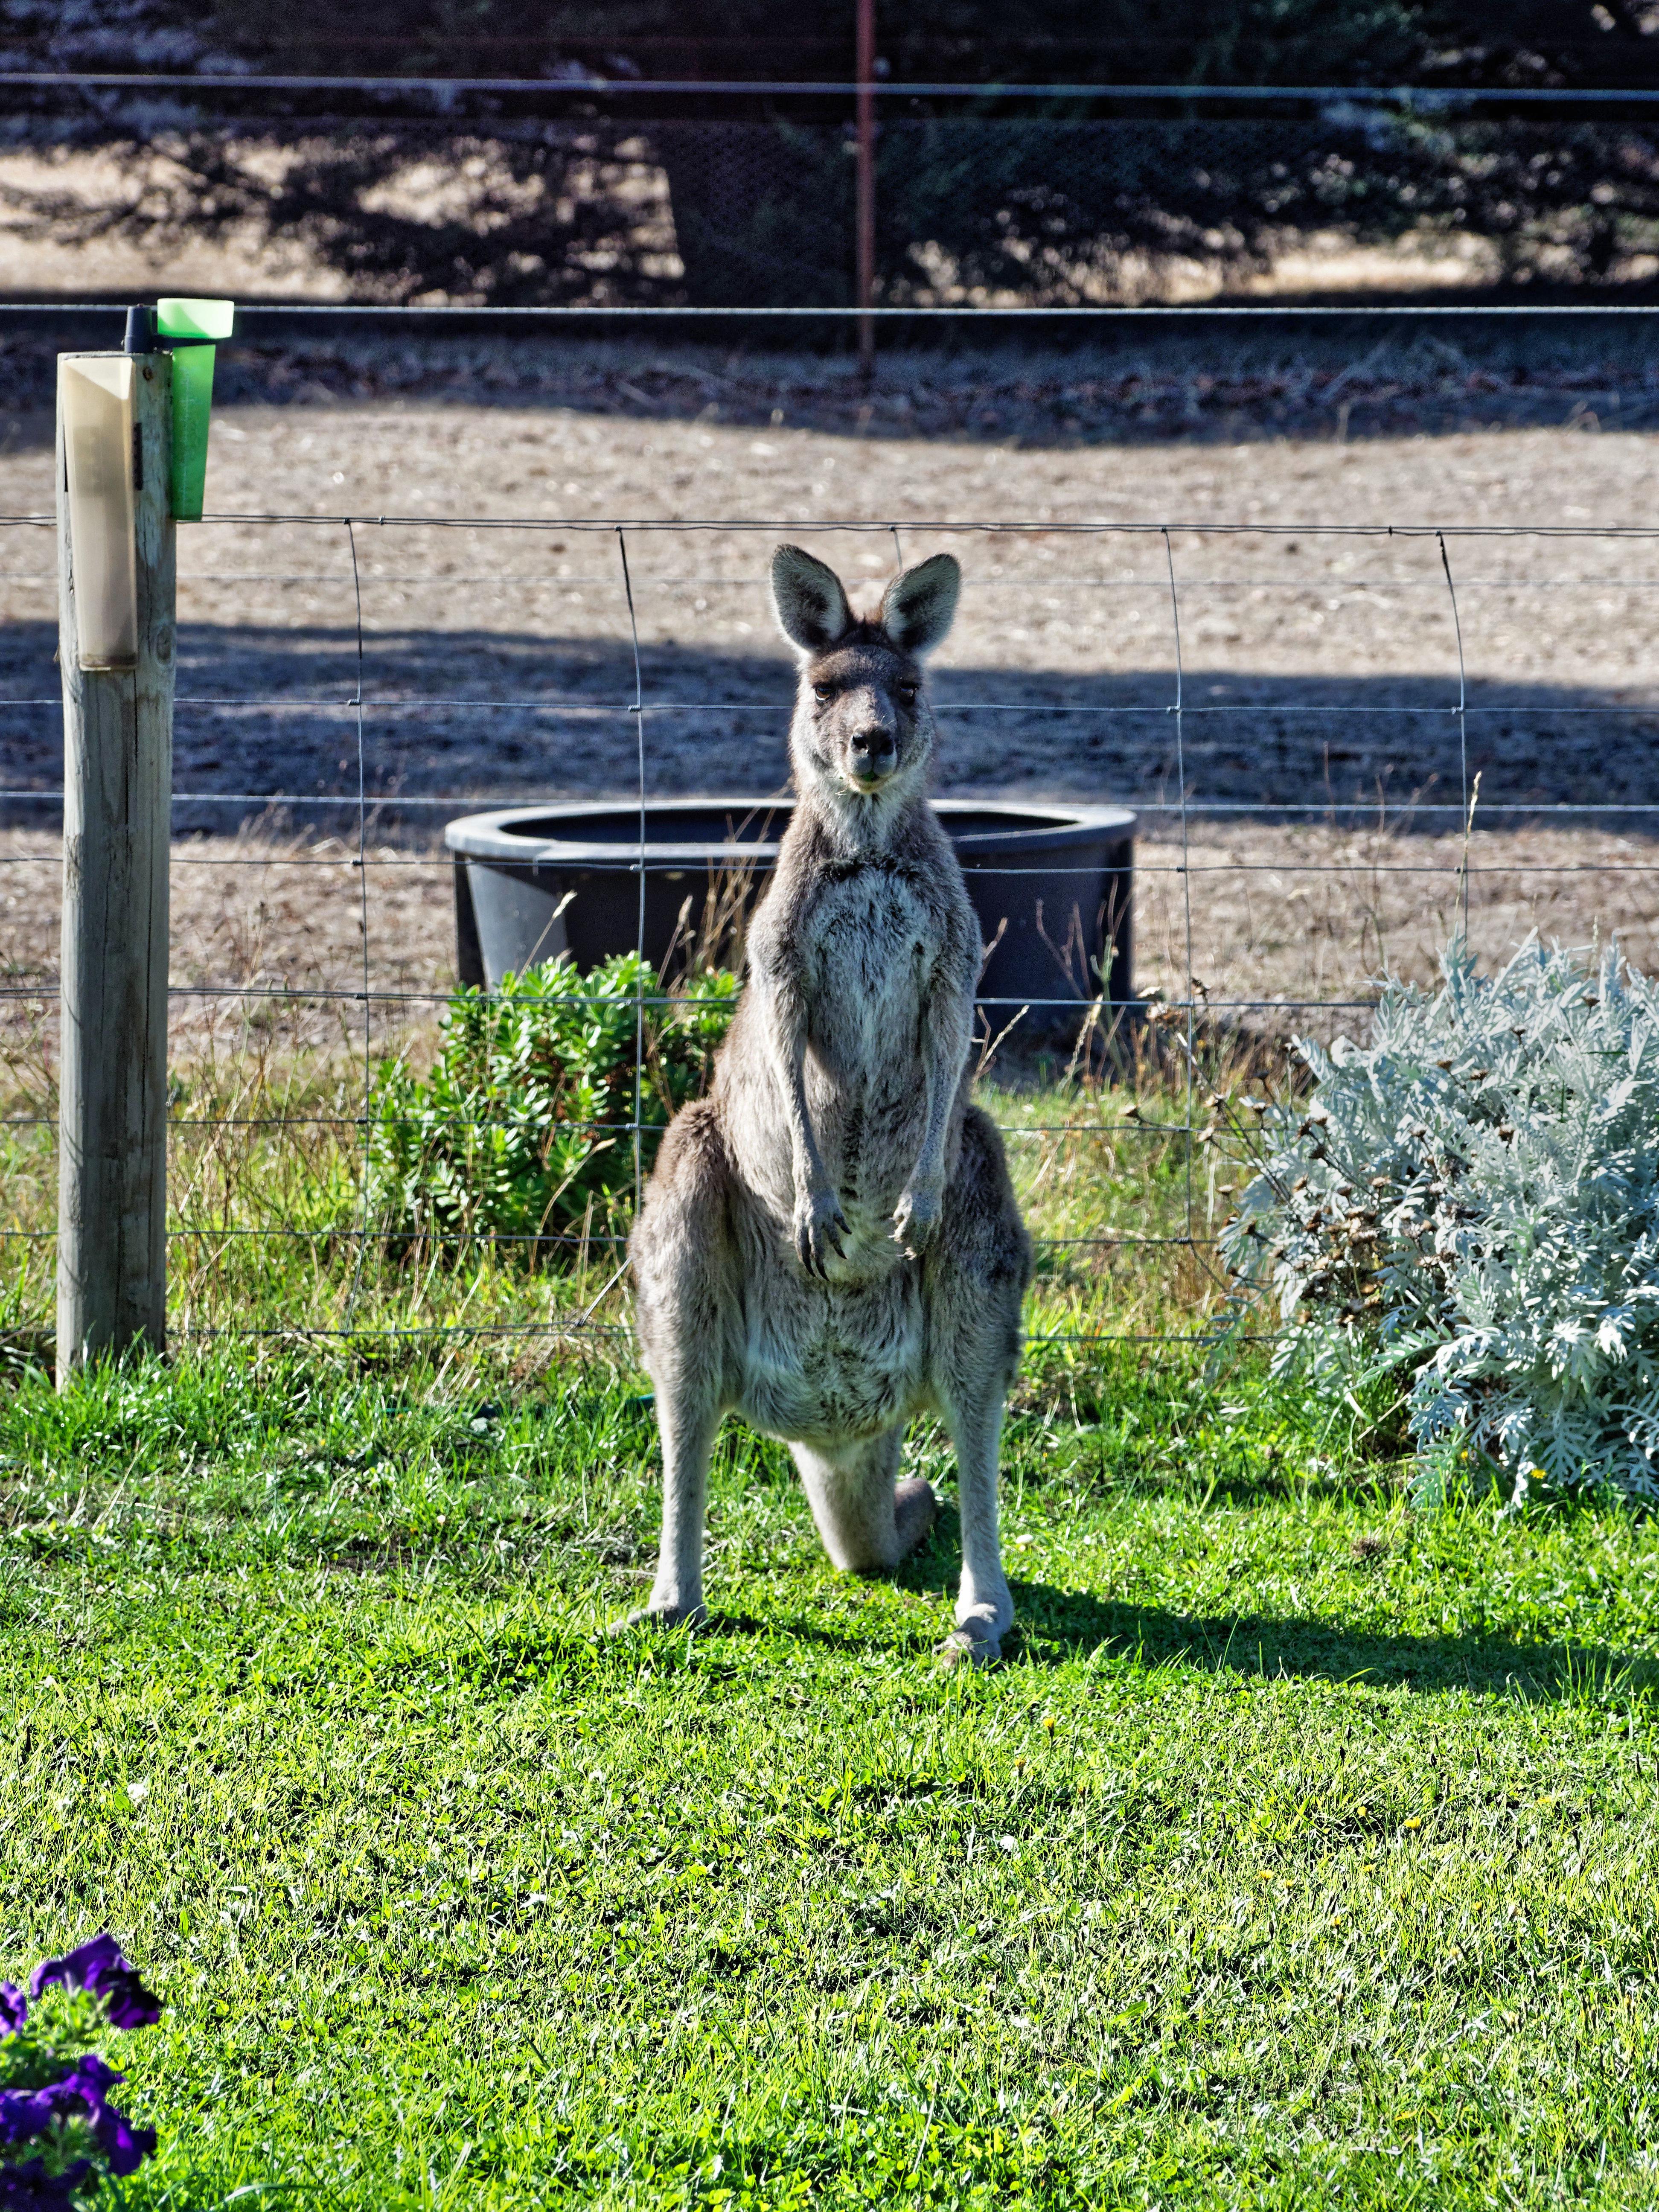 Kangaroo-6.jpeg